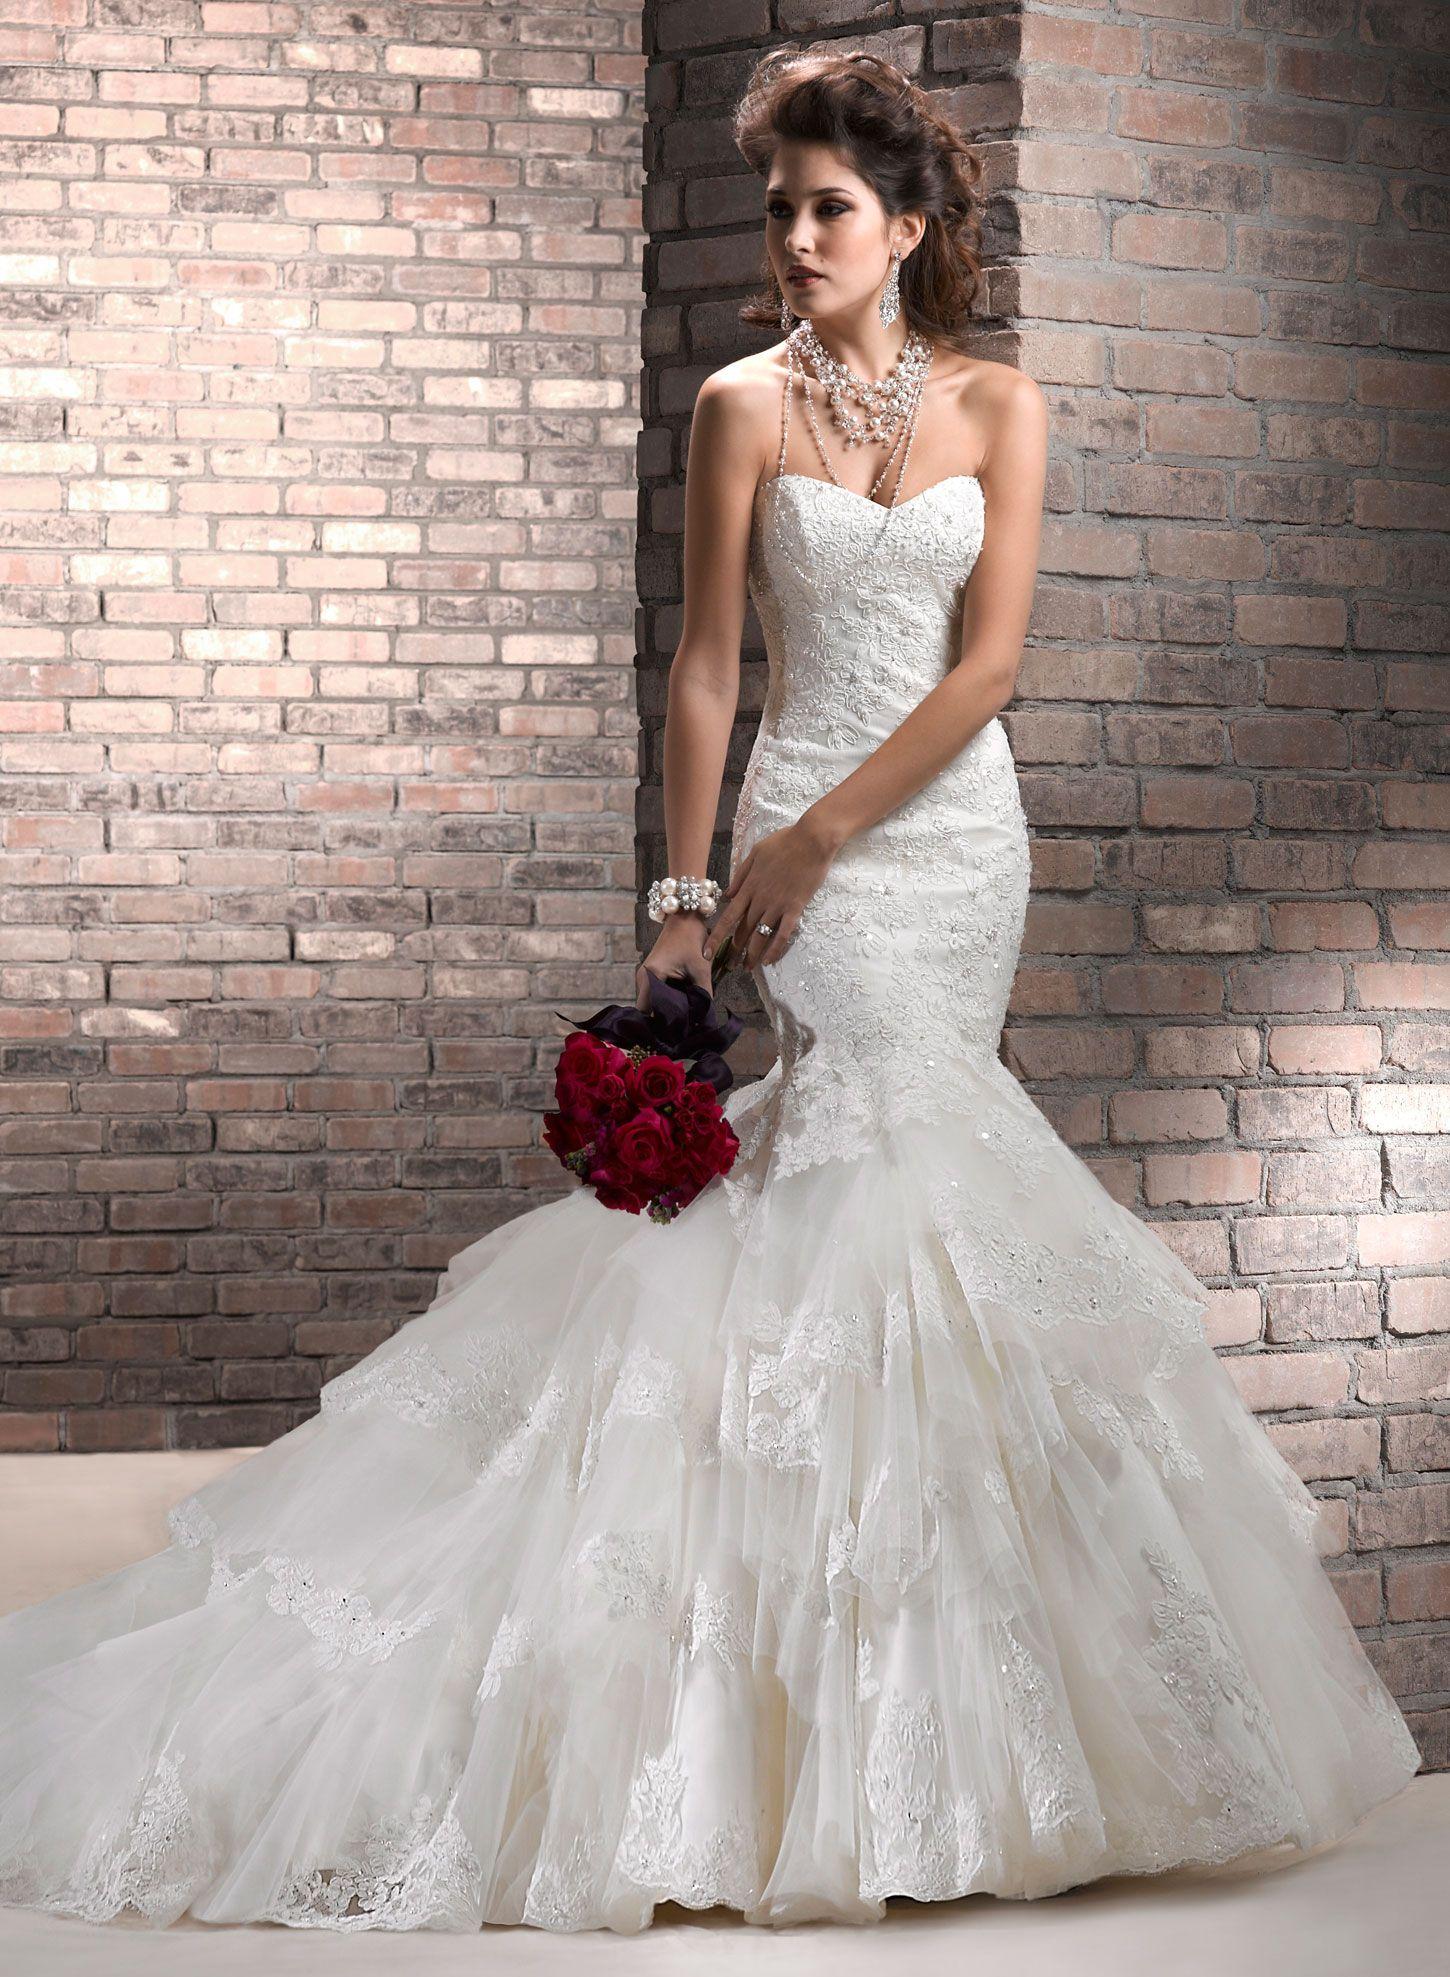 Trumpet style wedding dresses  Maggie Sottero Wedding Dresses  Maggie sottero Wedding dress and